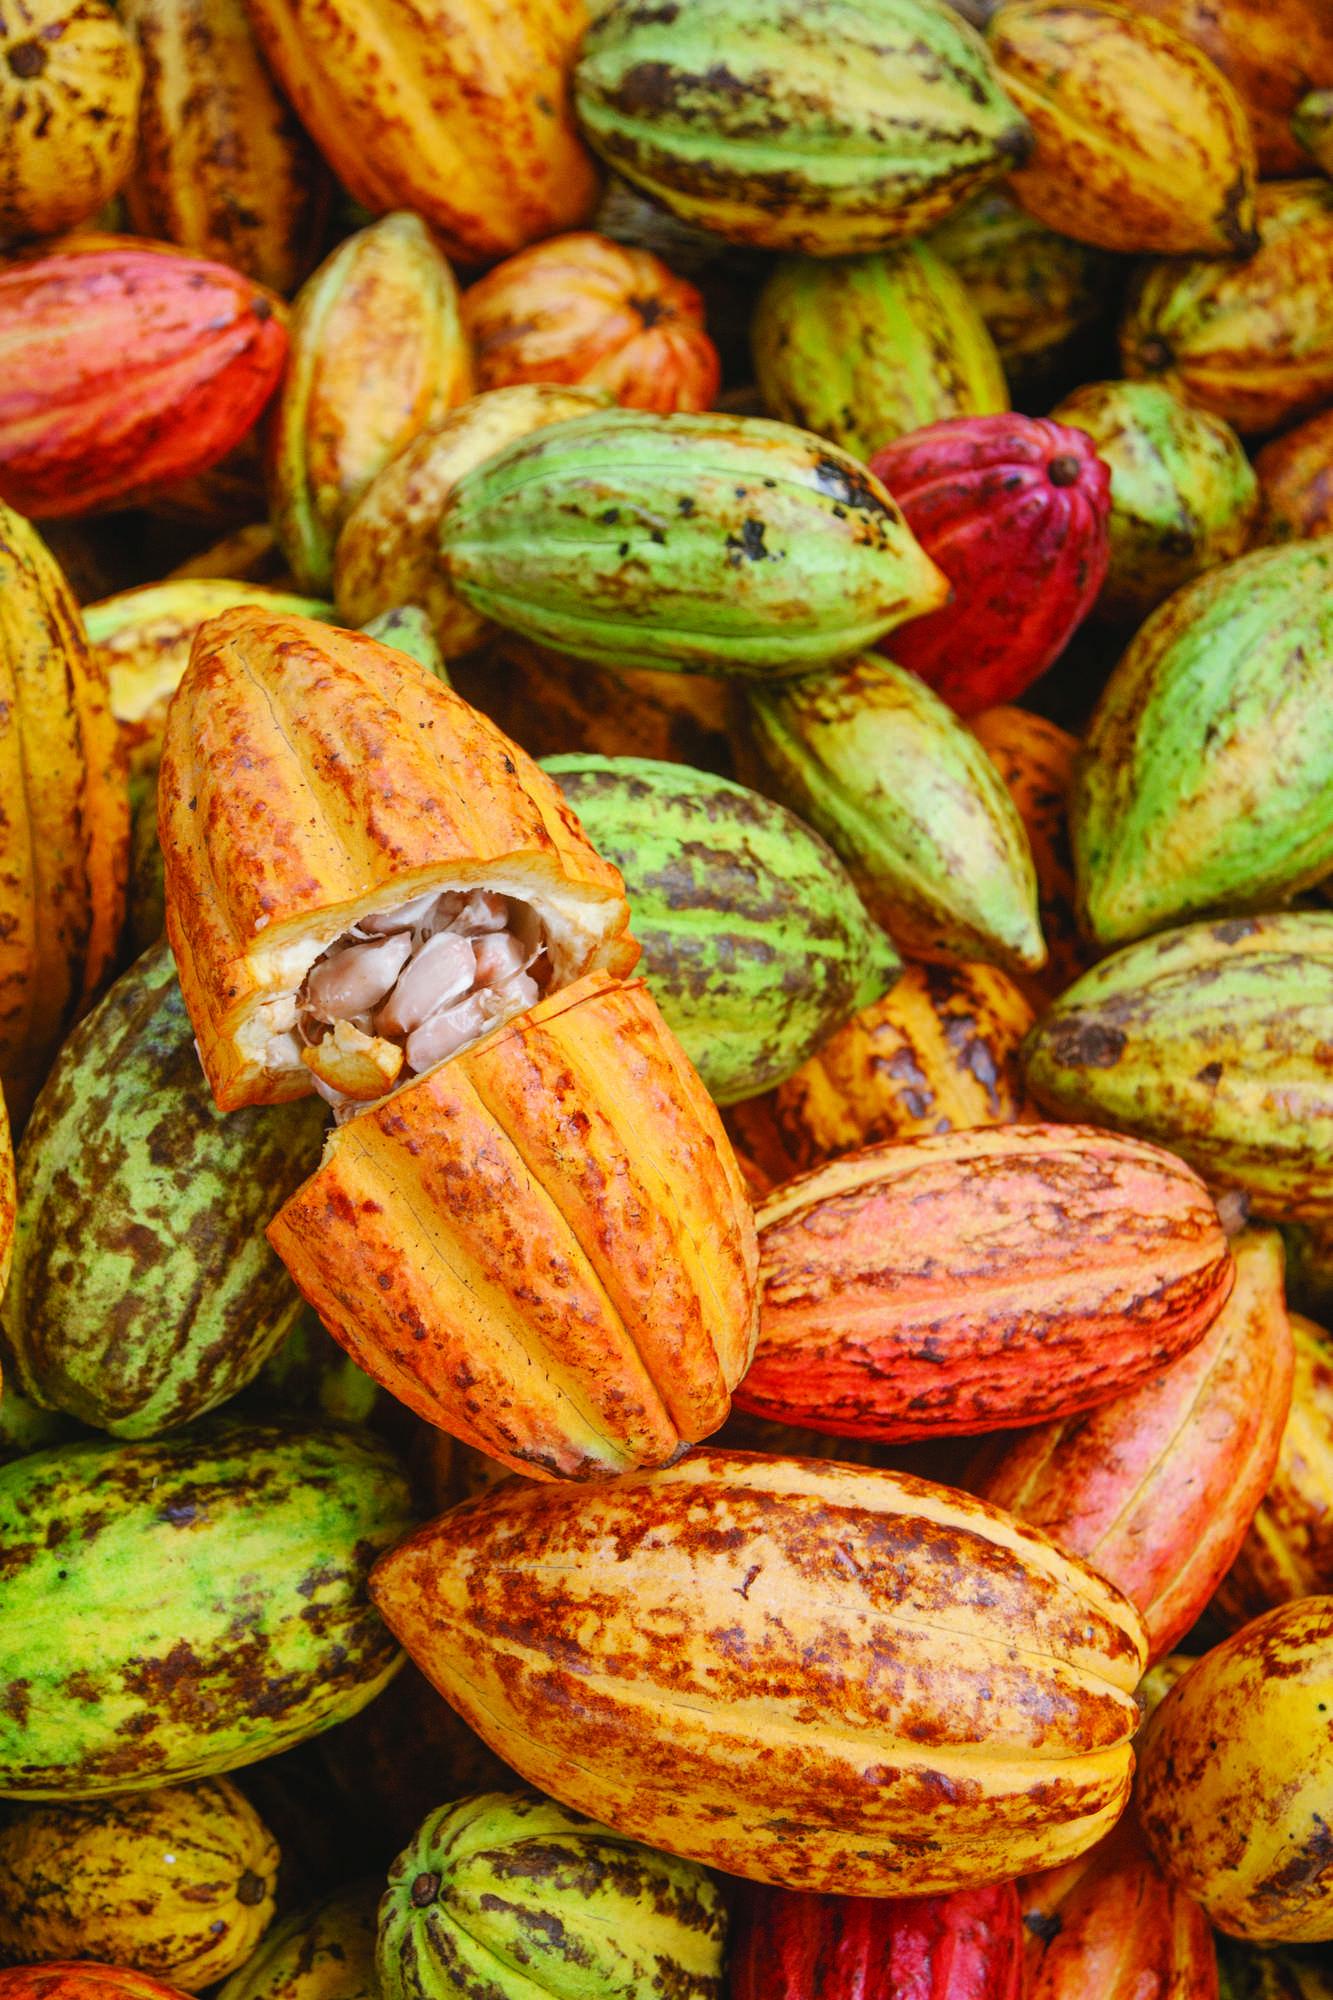 chiang mai coco northern thailand s hidden chocolate farms rh chiangmaicitylife com